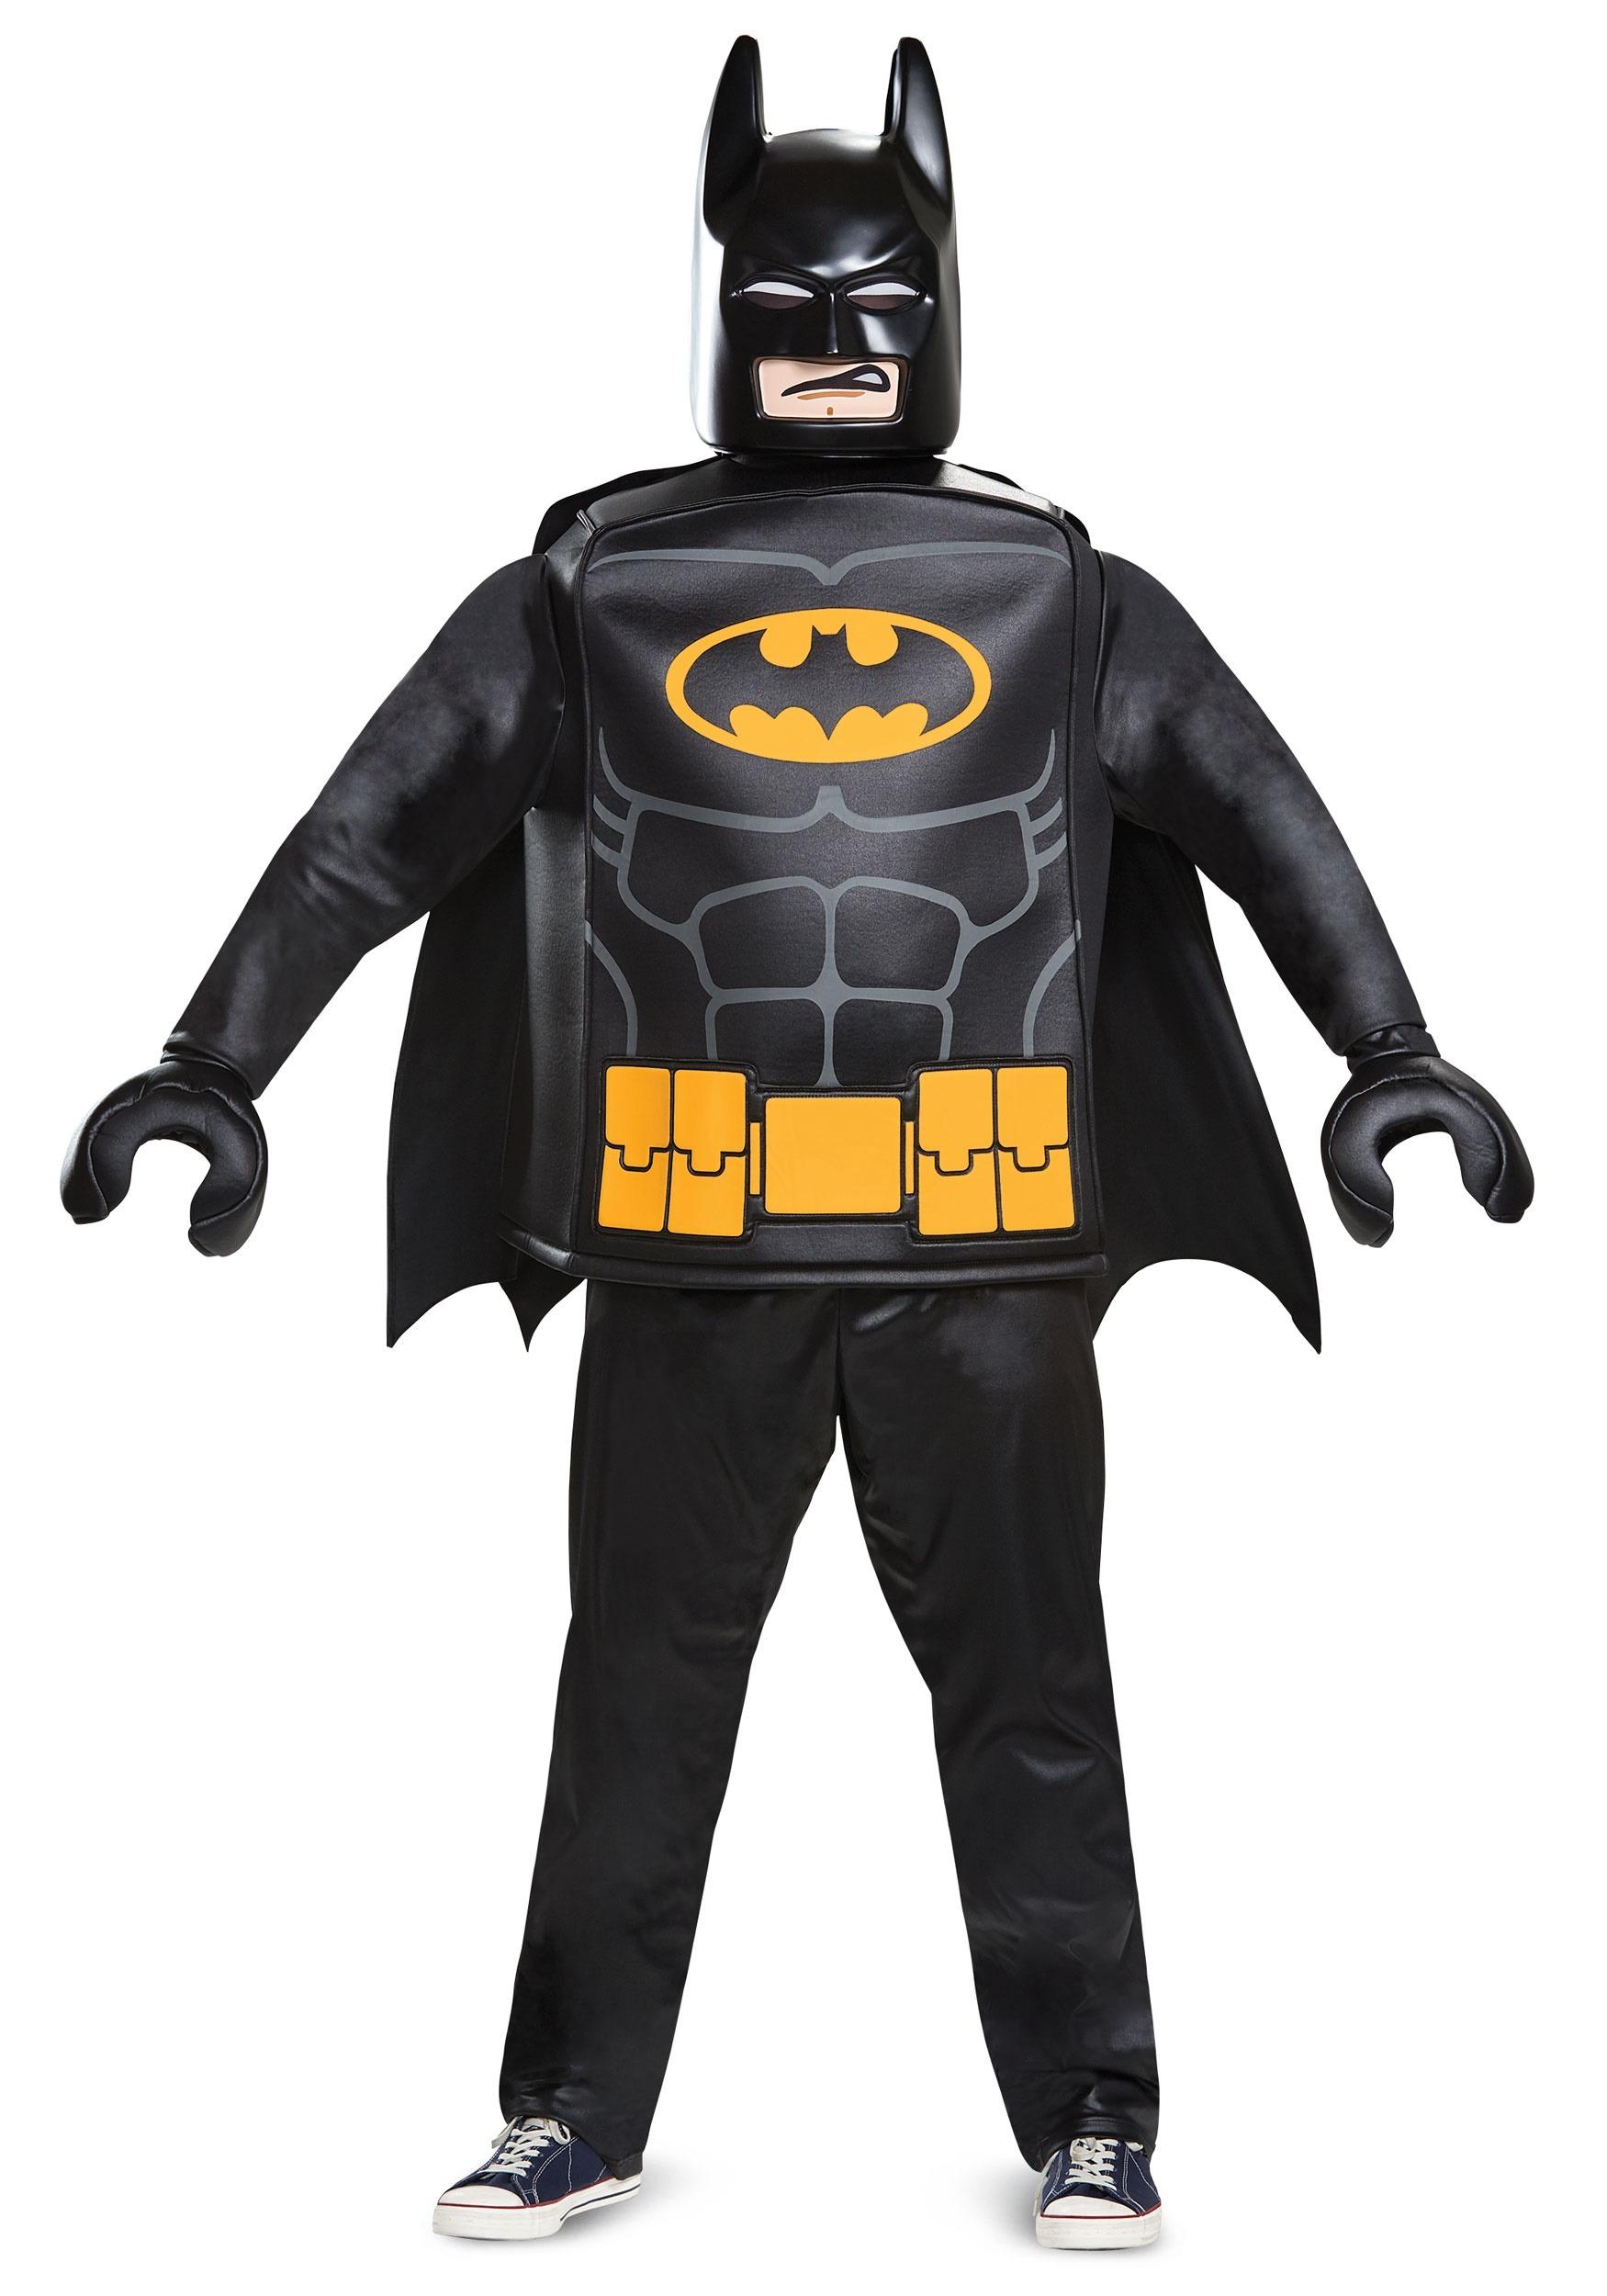 Adult Lego Batman Deluxe Batman Costume